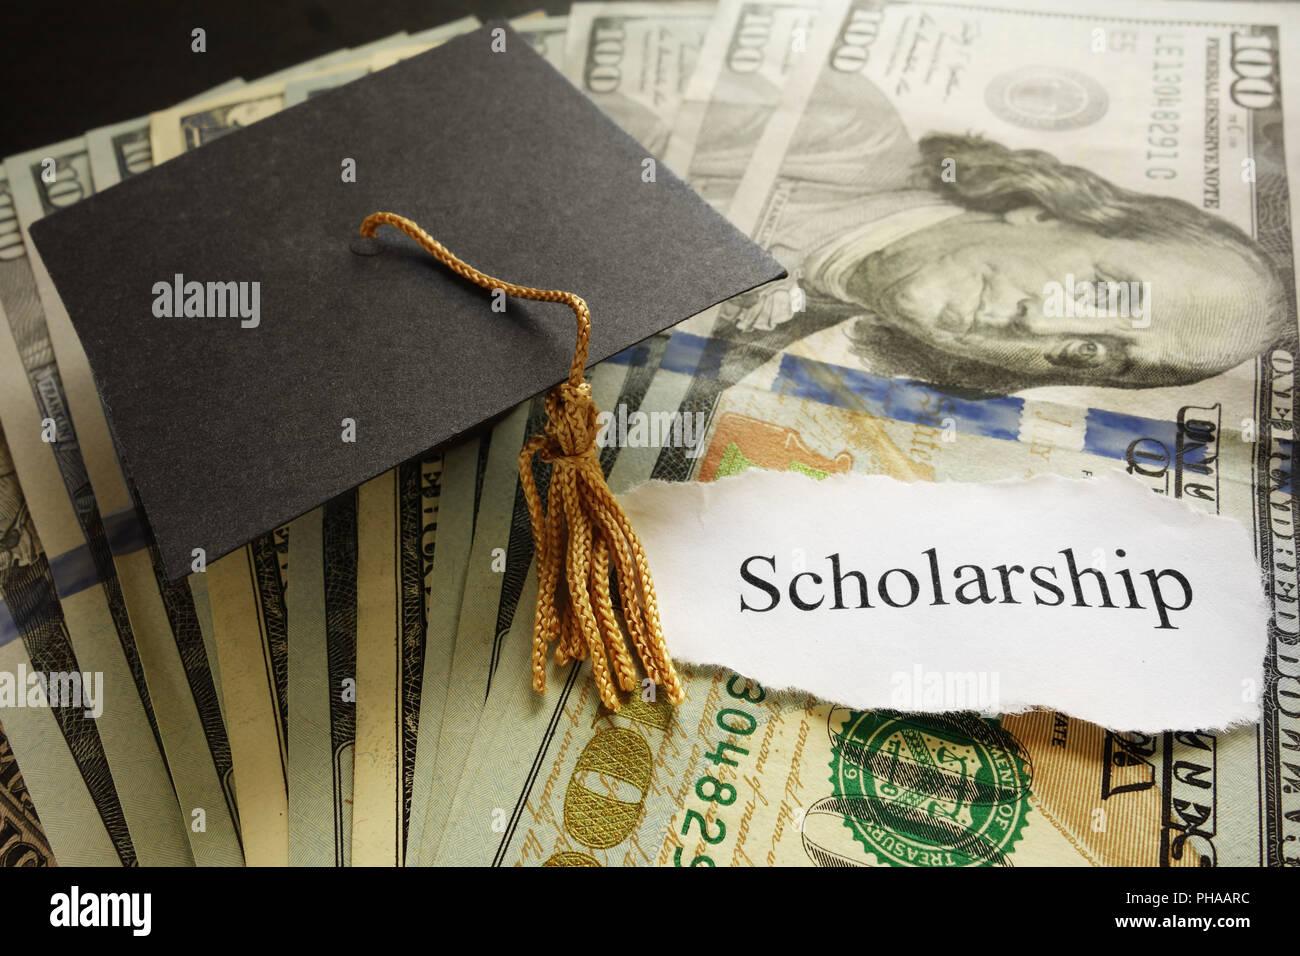 Scholarship note - Stock Image